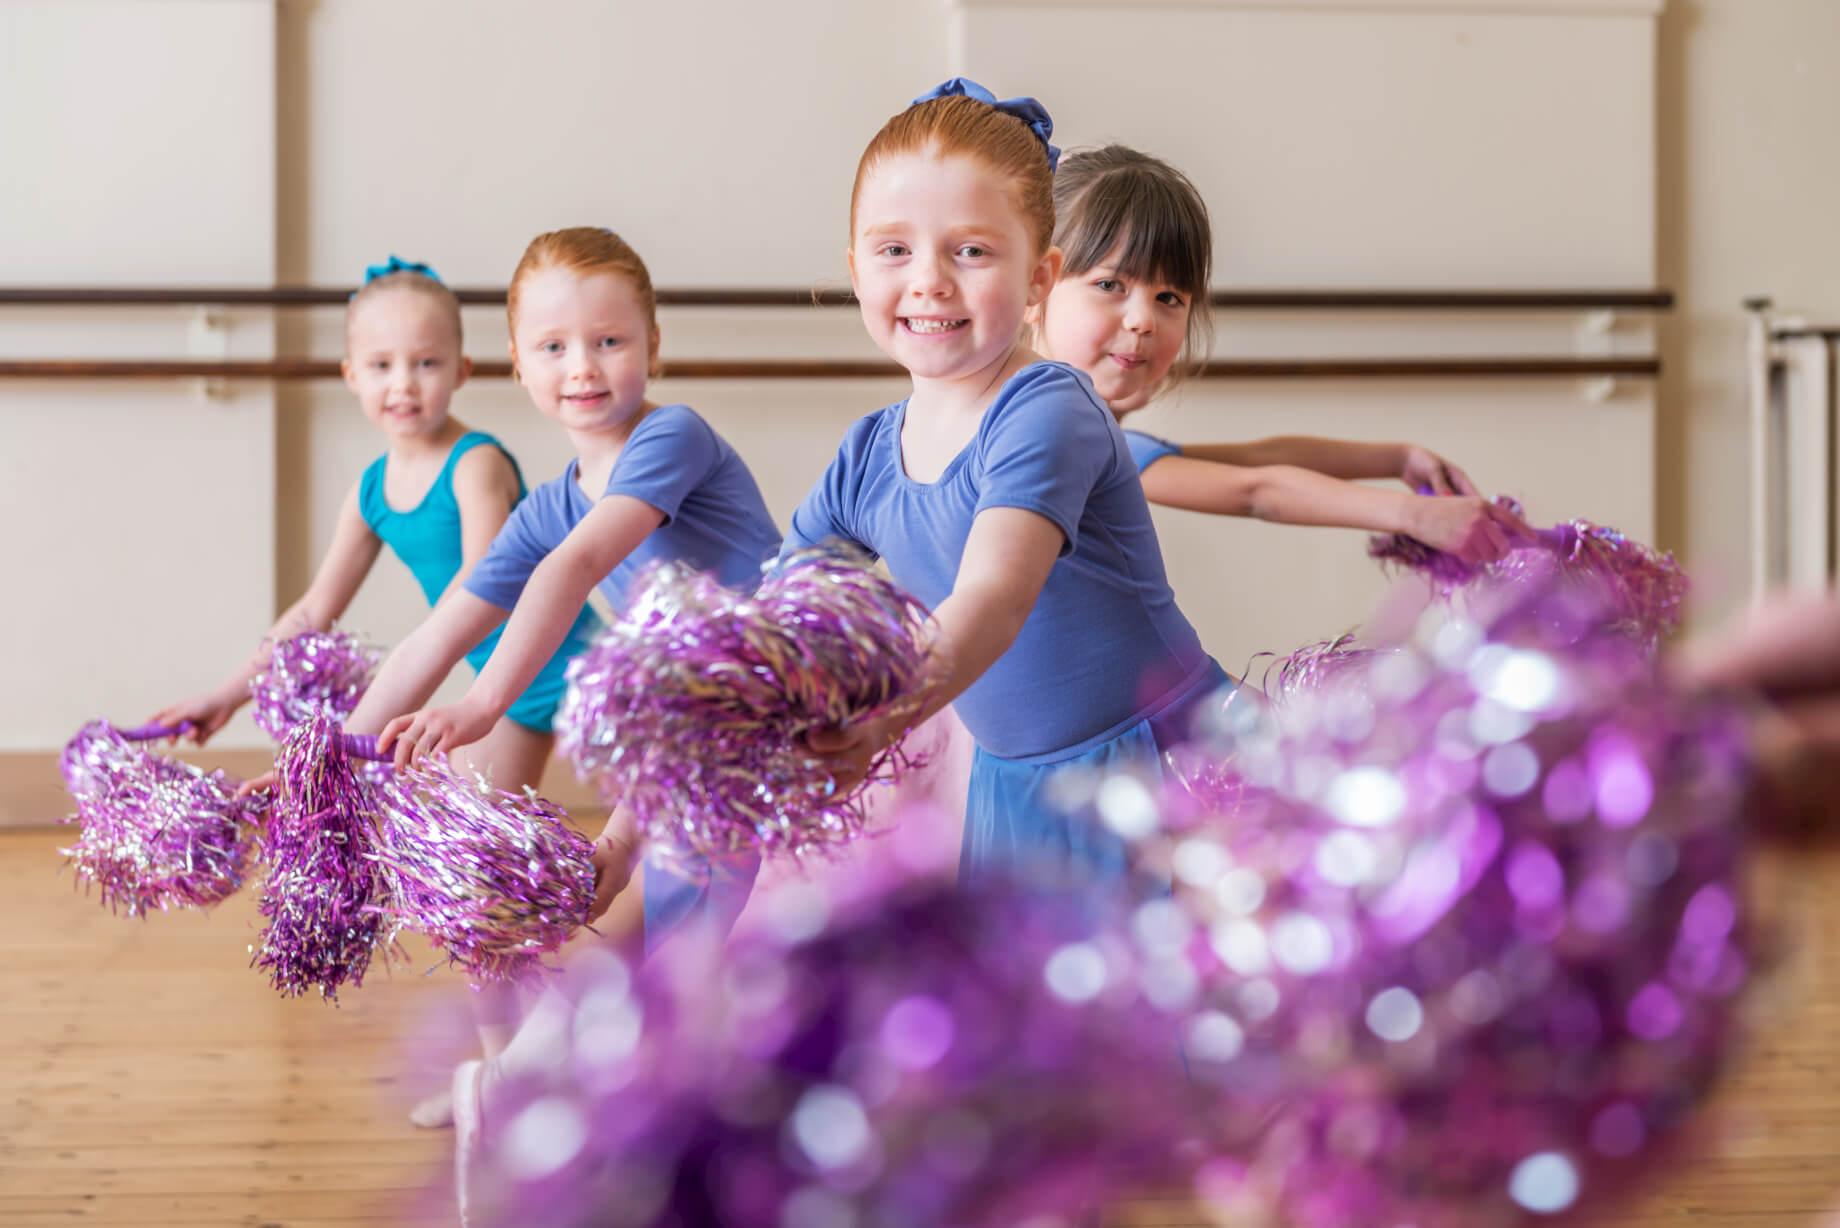 rnsd-rutleigh-norris-dance-school-young-girl-dancers-class-pom-poms-purple-blue.jpg